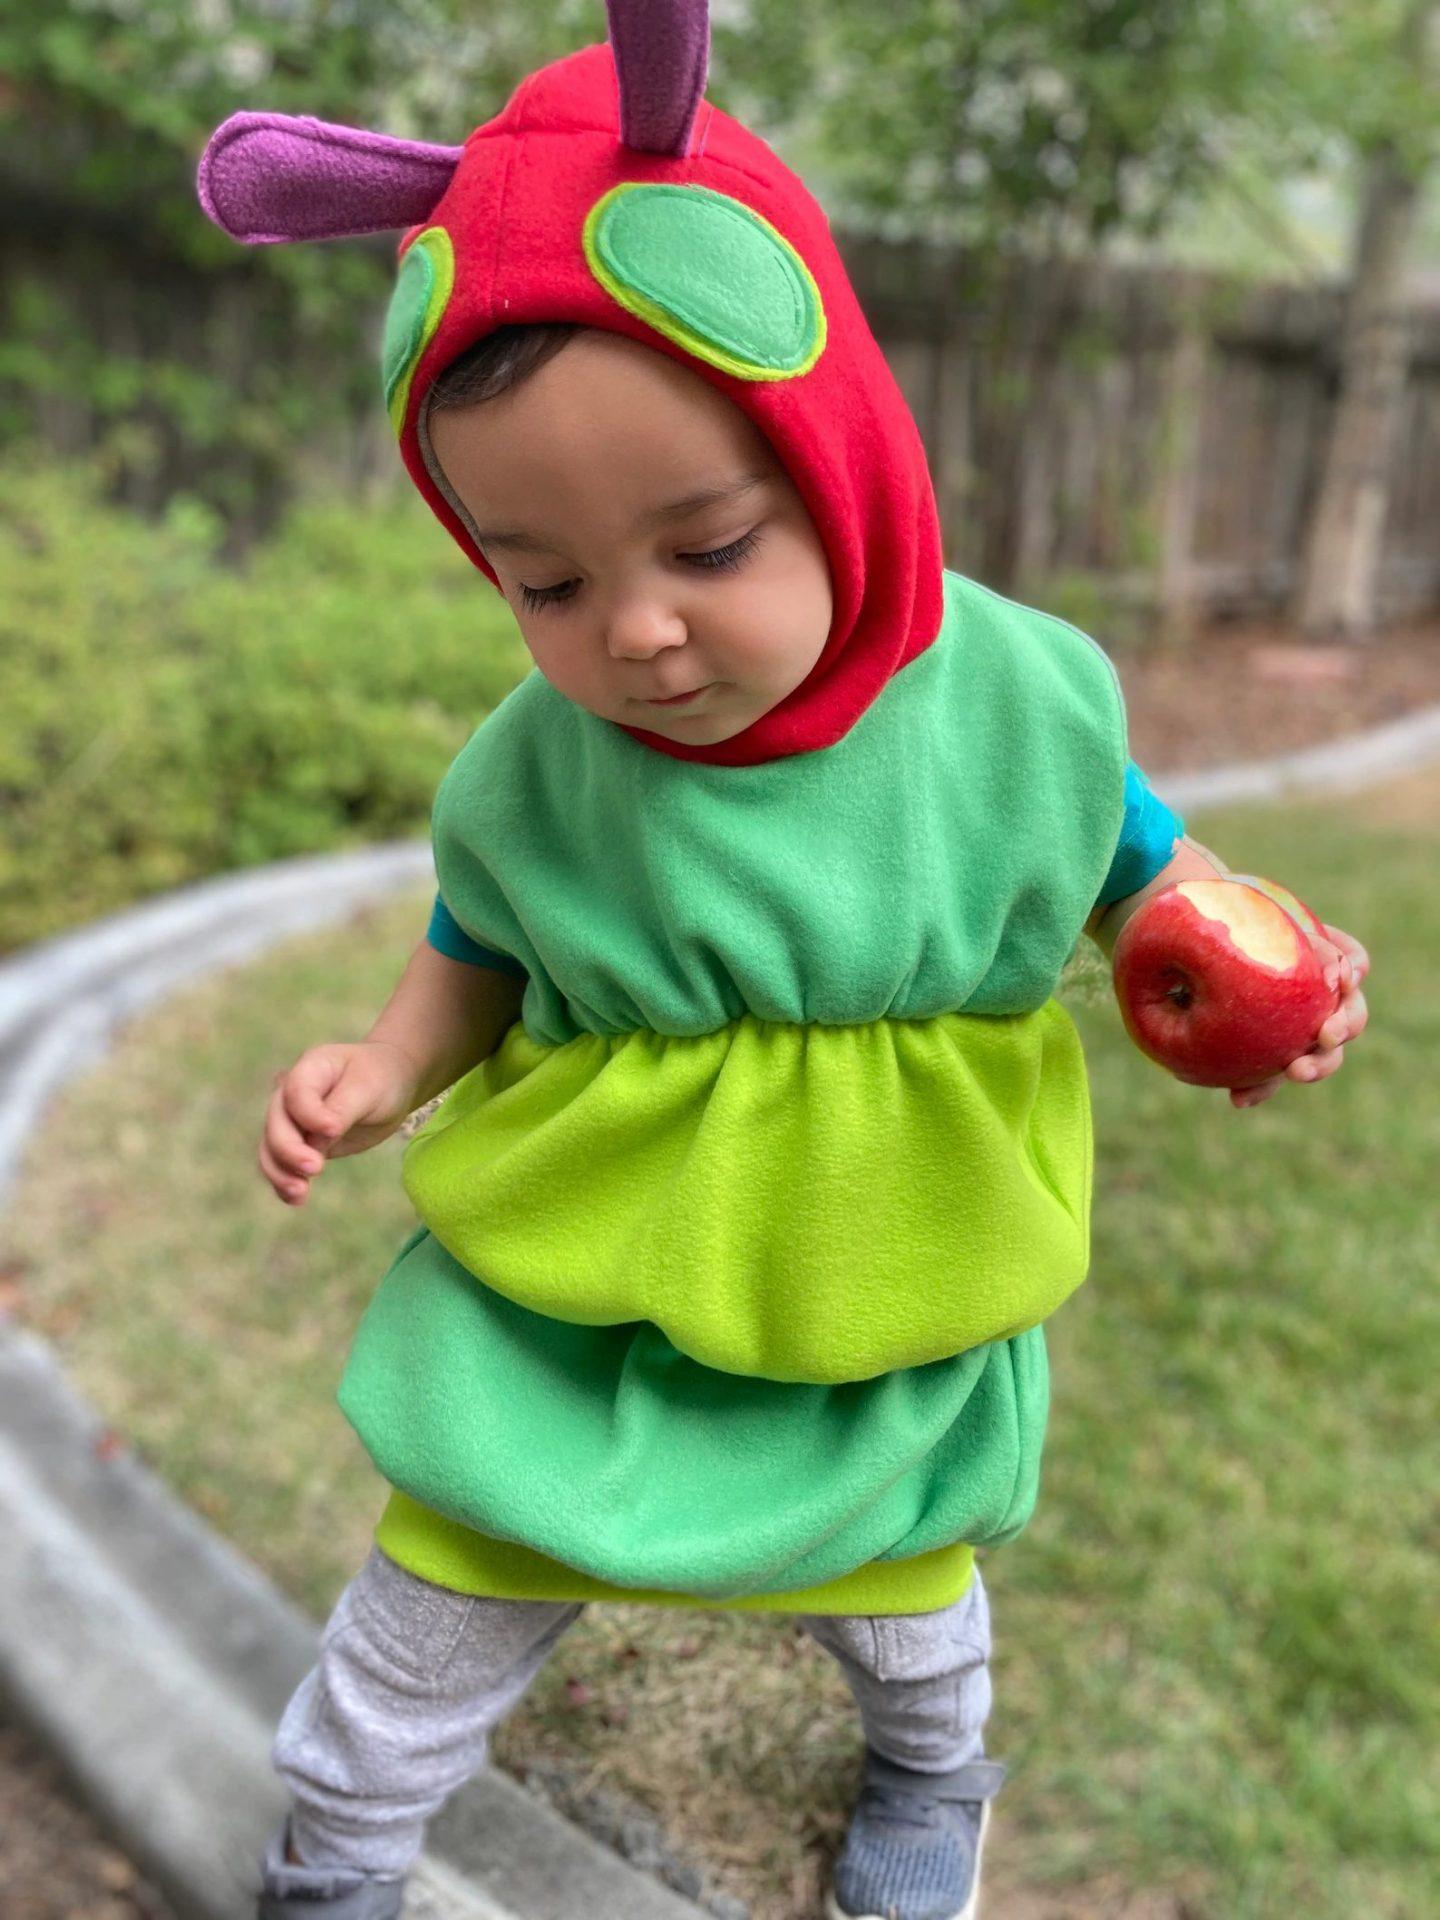 Caterpillar Halloween costume for babies